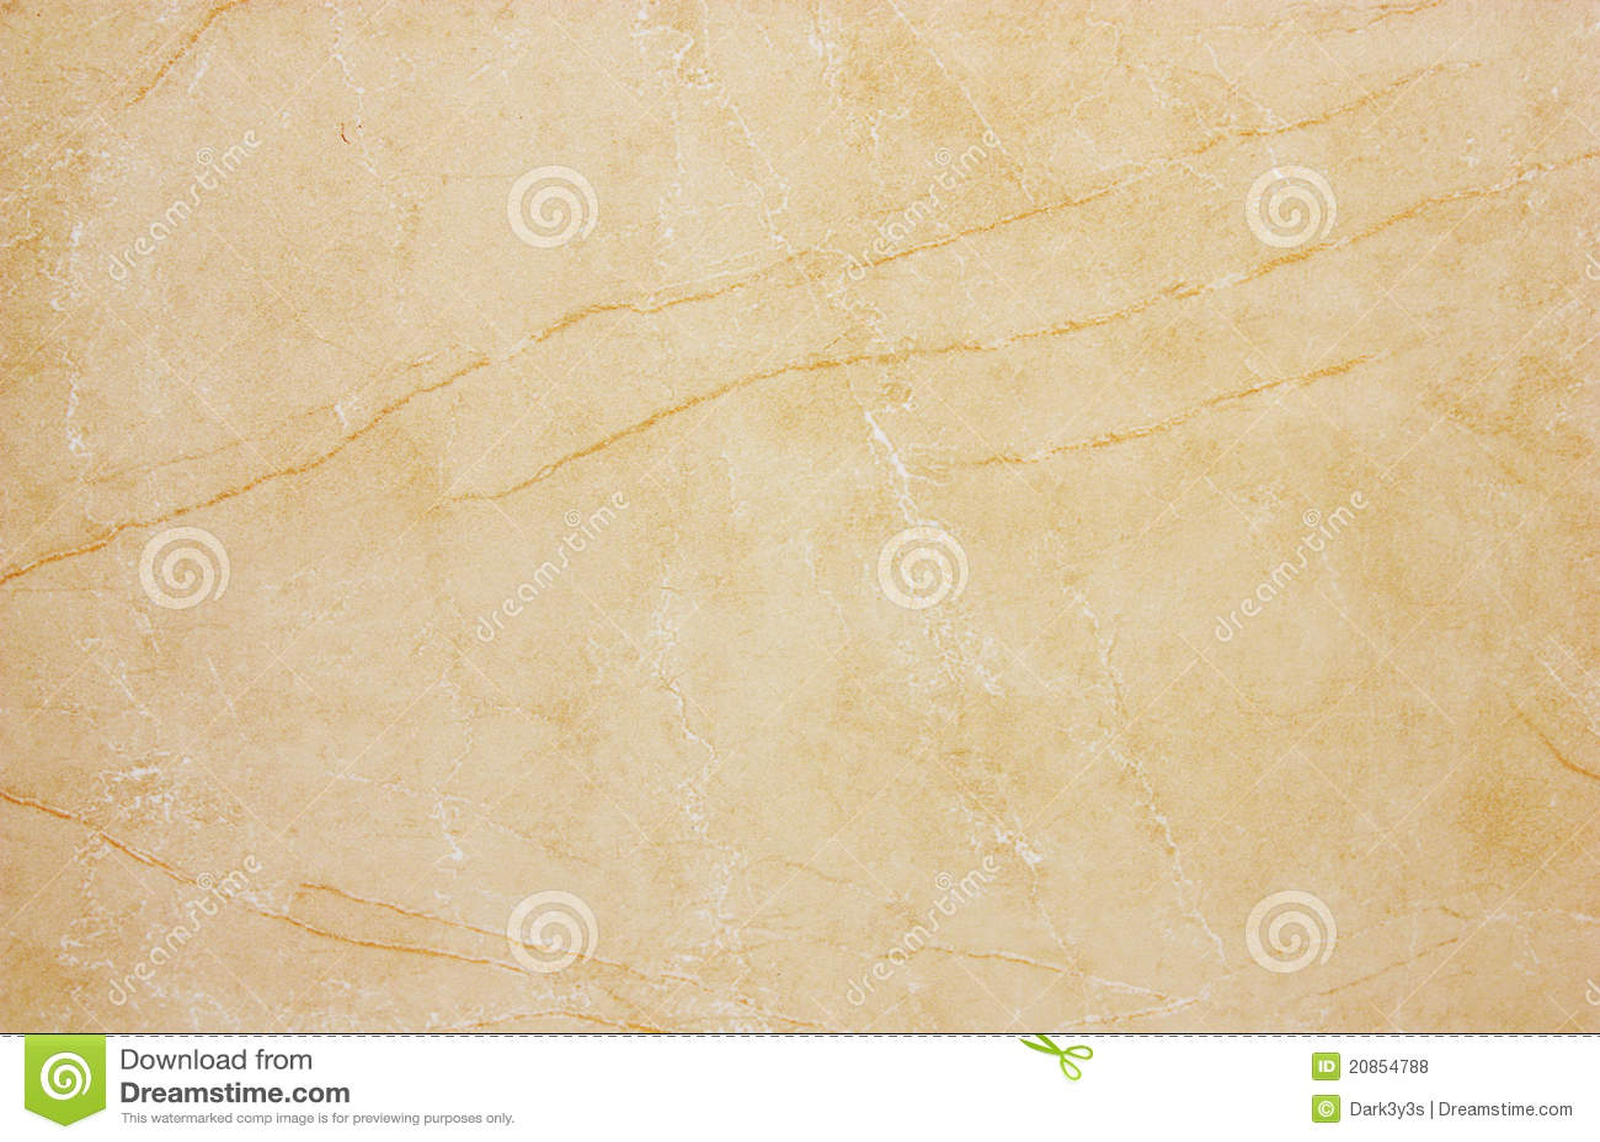 texture de marbre beige photos libres de droits image 20854788. Black Bedroom Furniture Sets. Home Design Ideas